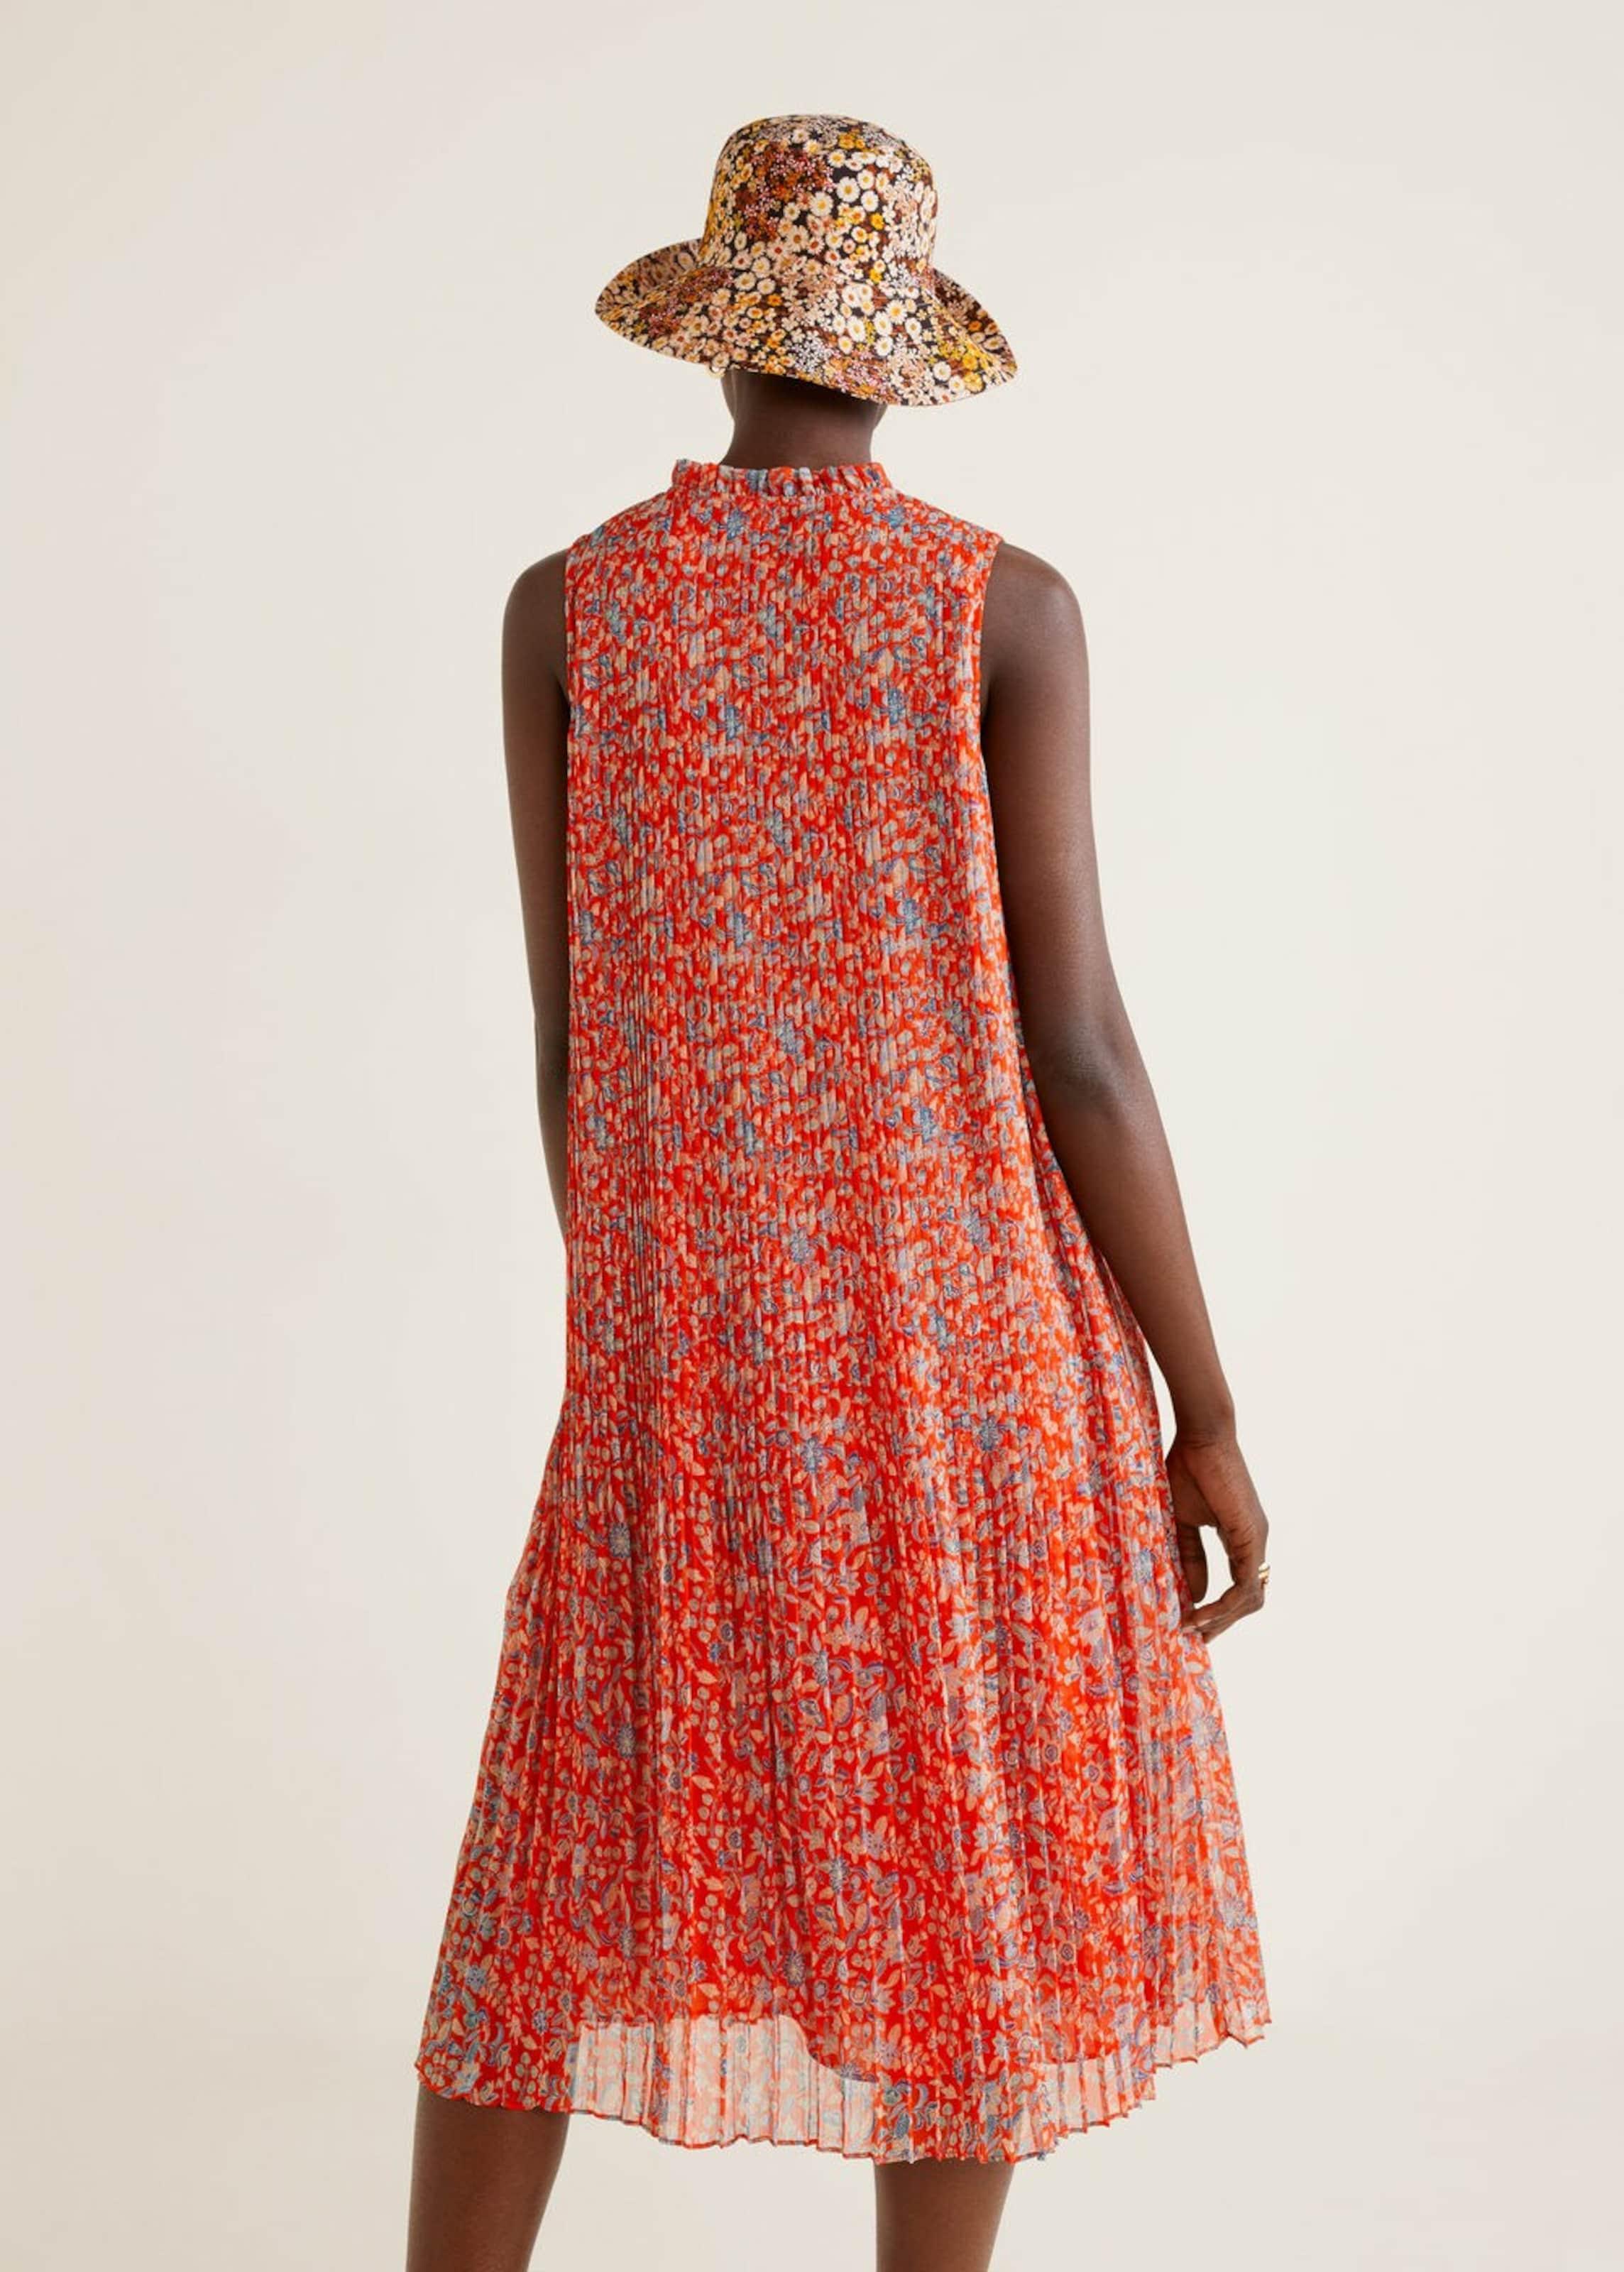 Mango Kleid BlauRot Mango In Kleid BlauRot 'pradito' In 'pradito' sxtrCdhQ